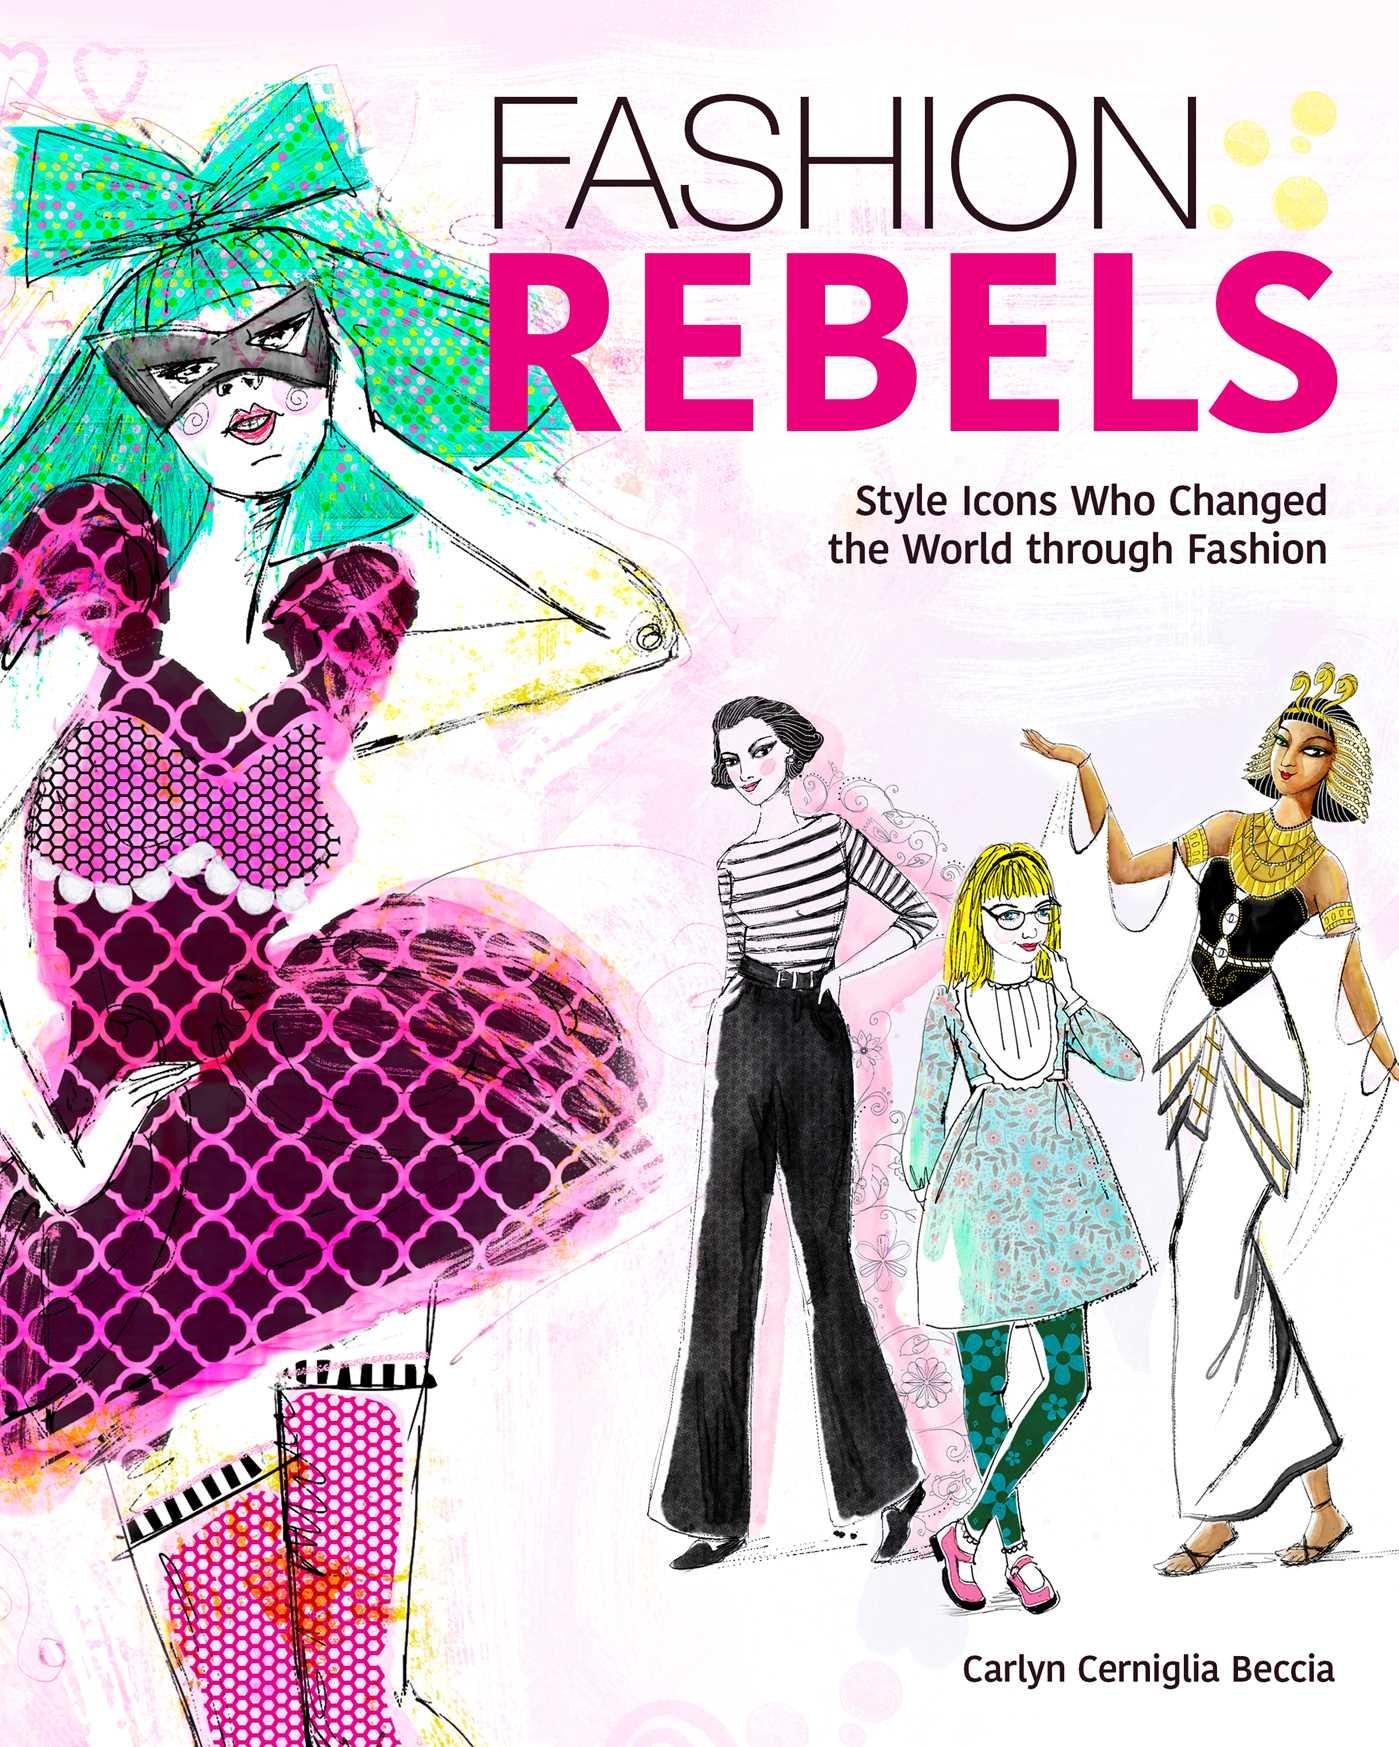 Fashion rebels 9781582704876 hr